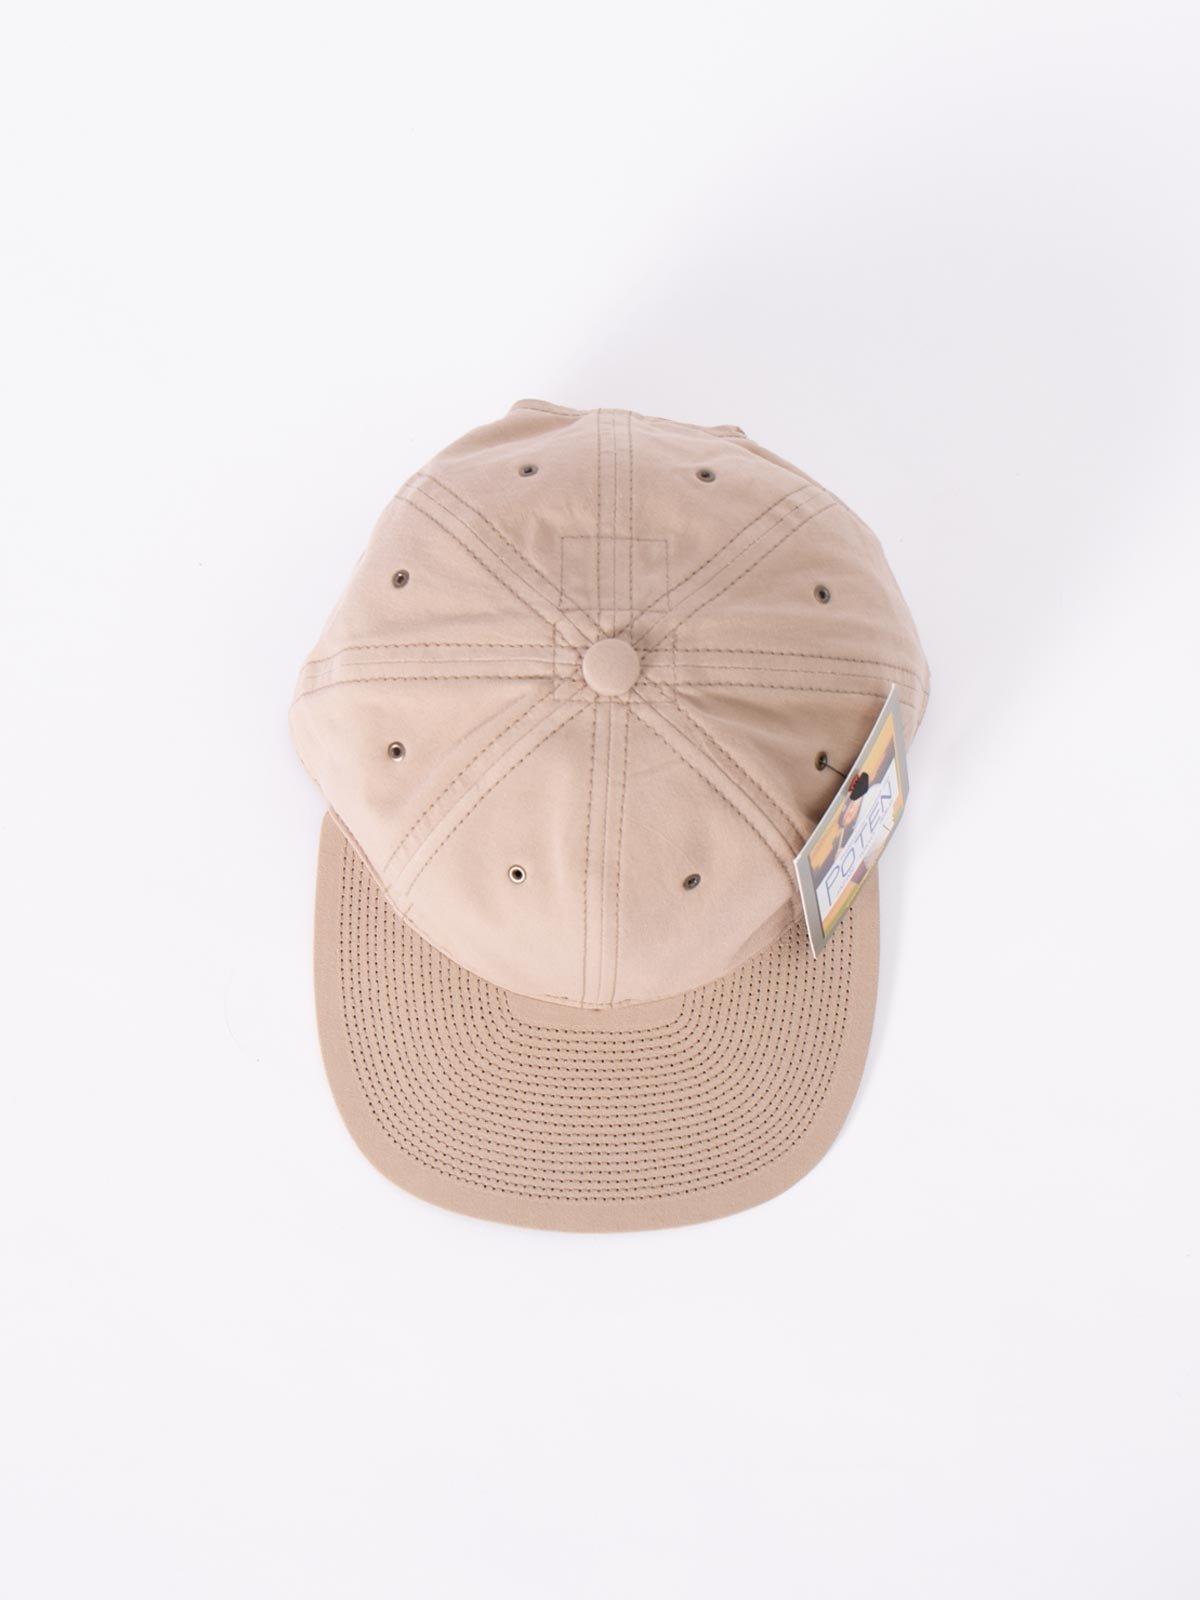 BEIGE WASHED COTTON CAP - Image 3